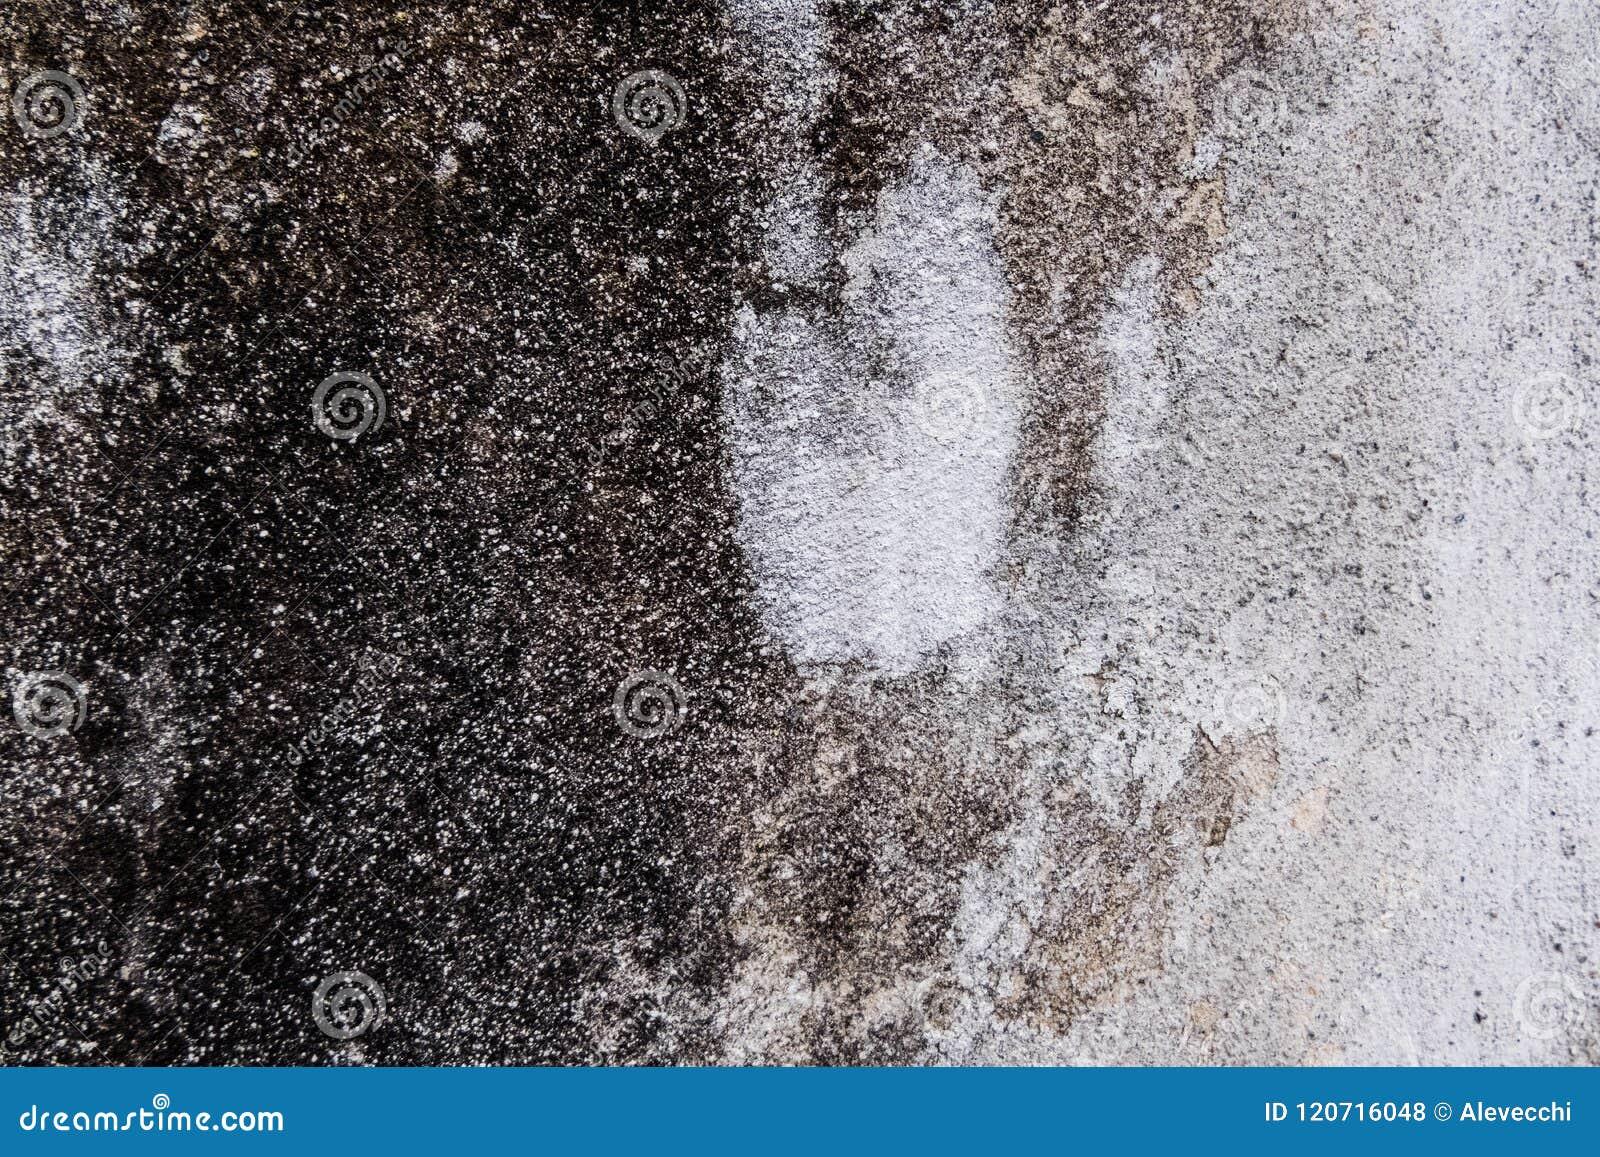 Grunge Worn Concrete Wall Txture Stock Photo